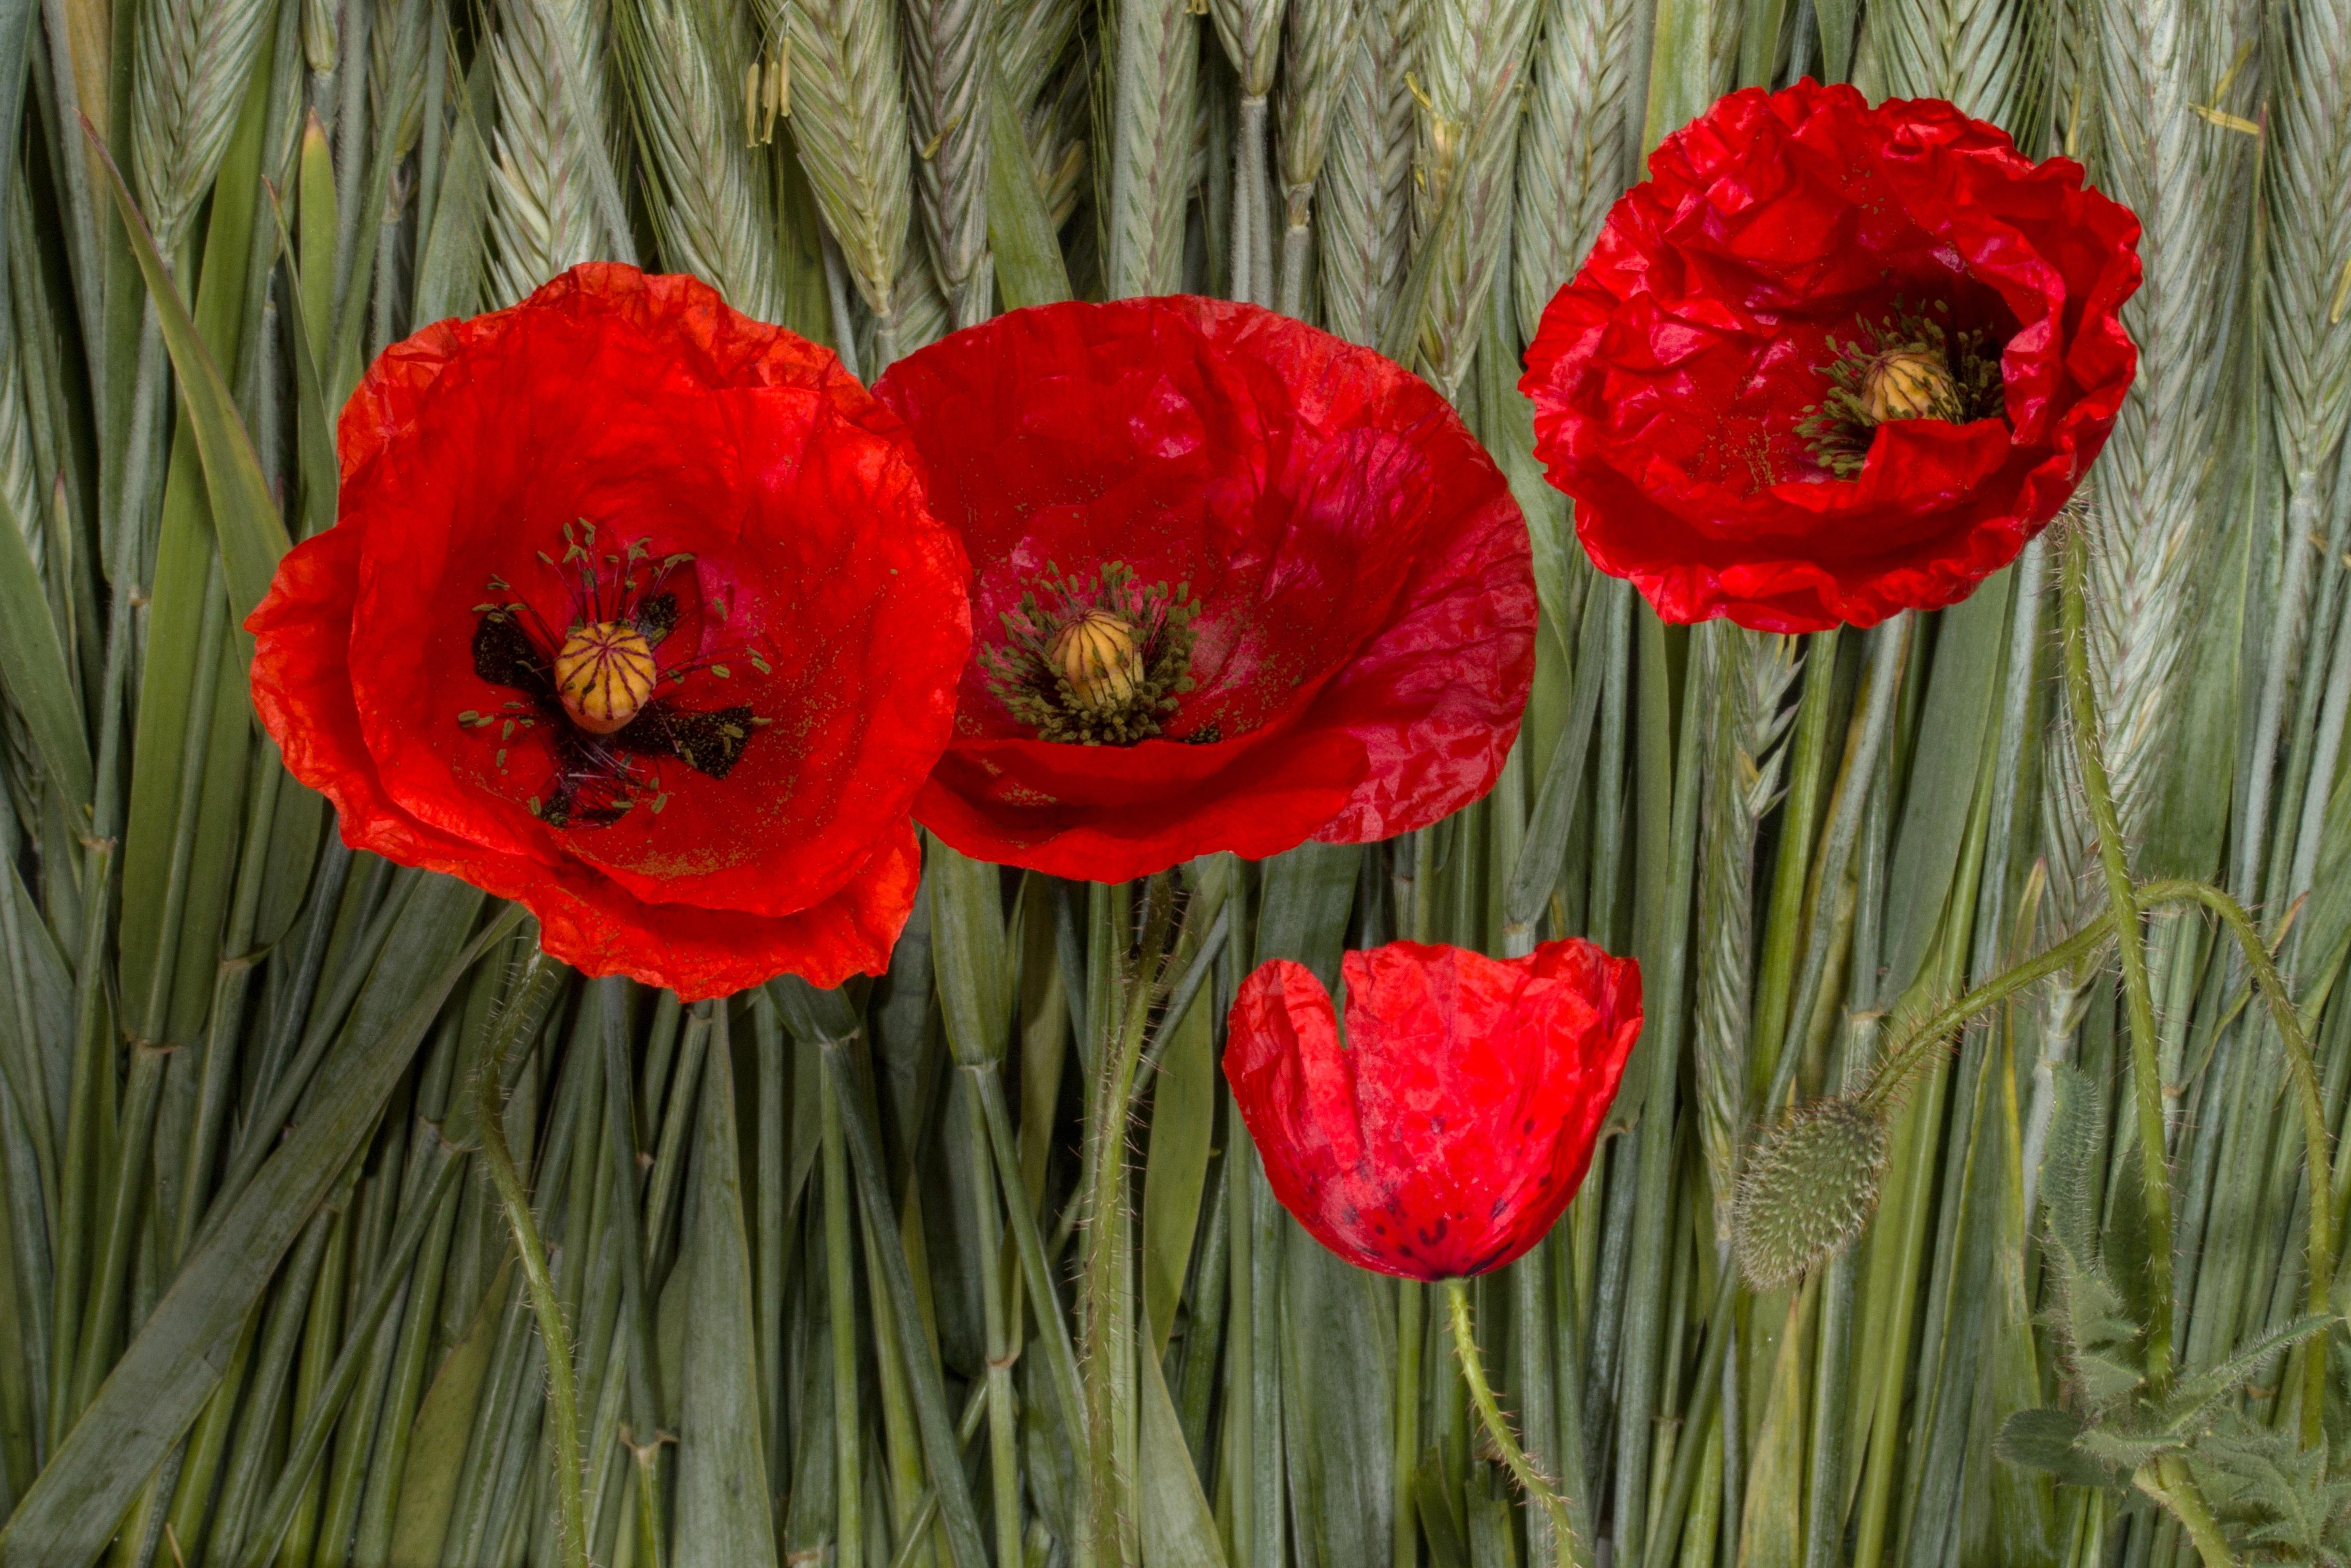 Free Images Petal Red Flora Klatschmohn Poppy Flower Cereals